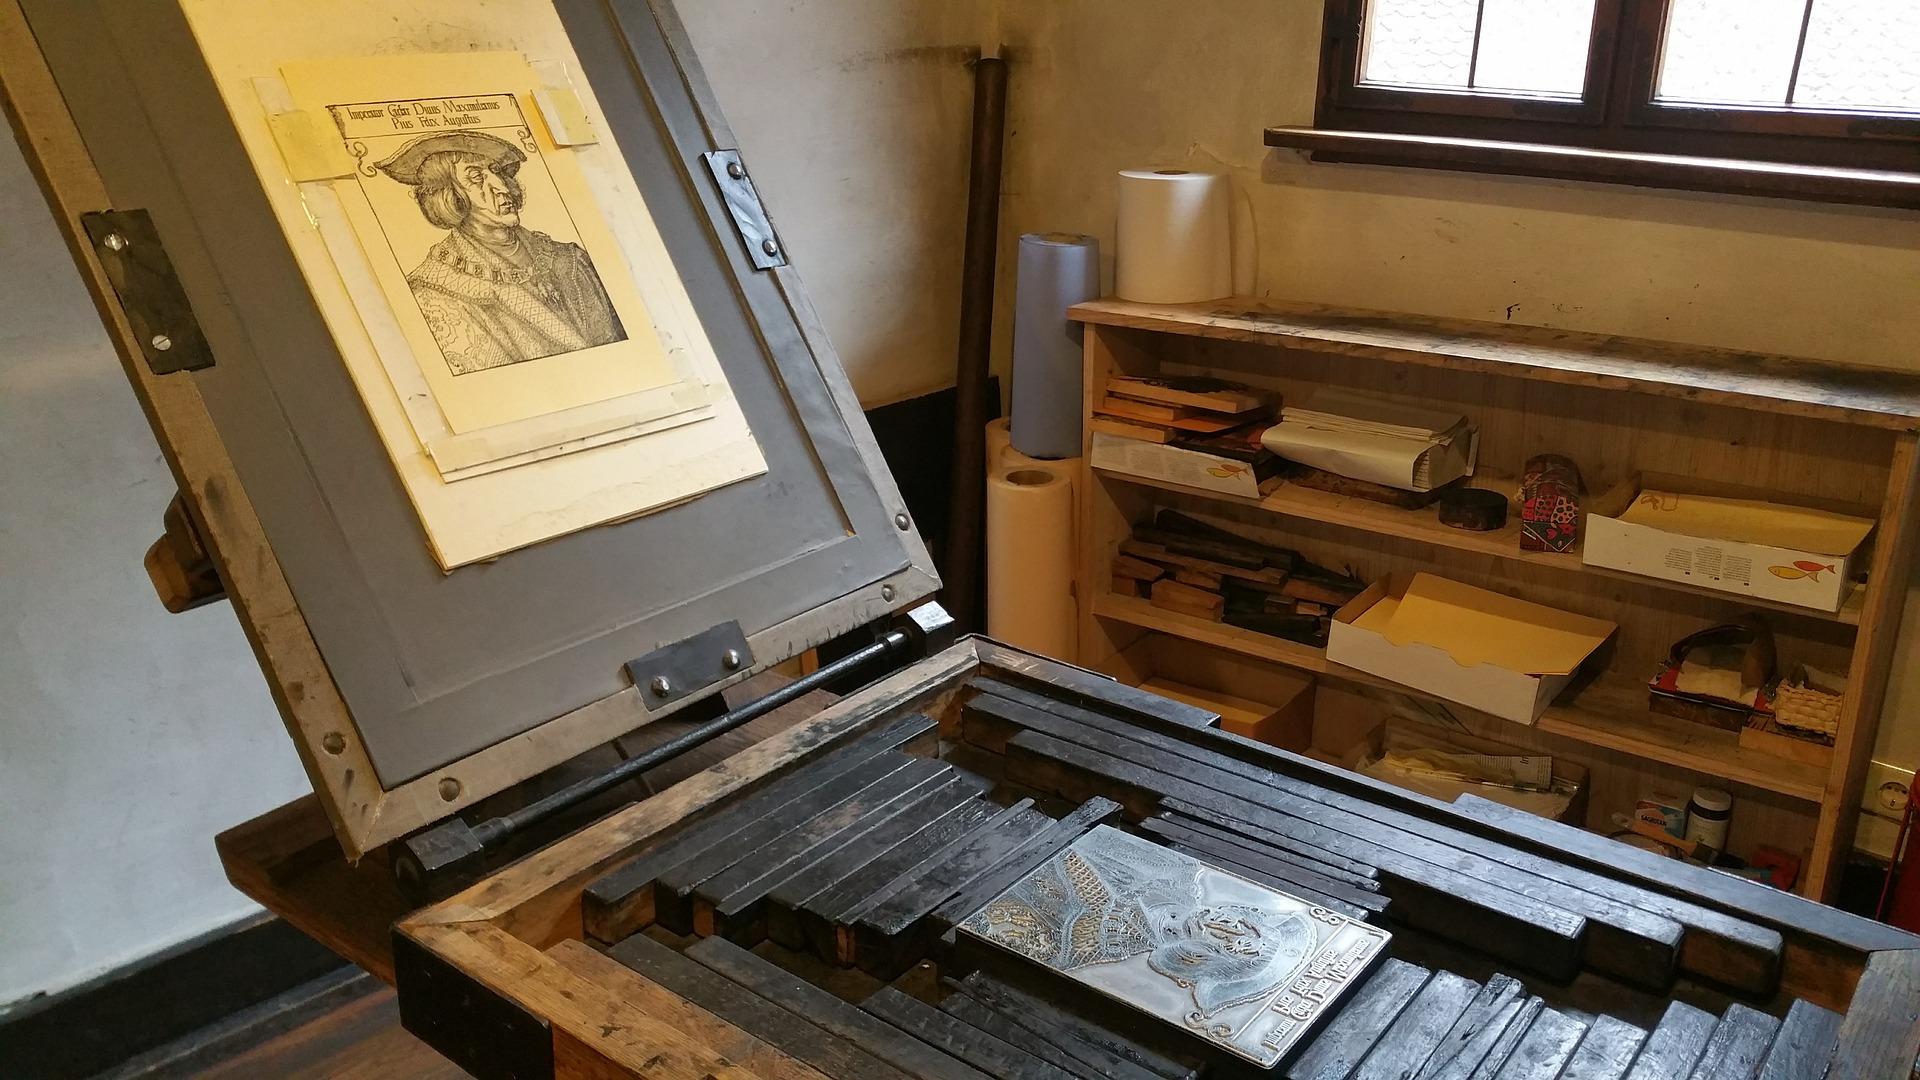 printing-press-3086828_1920